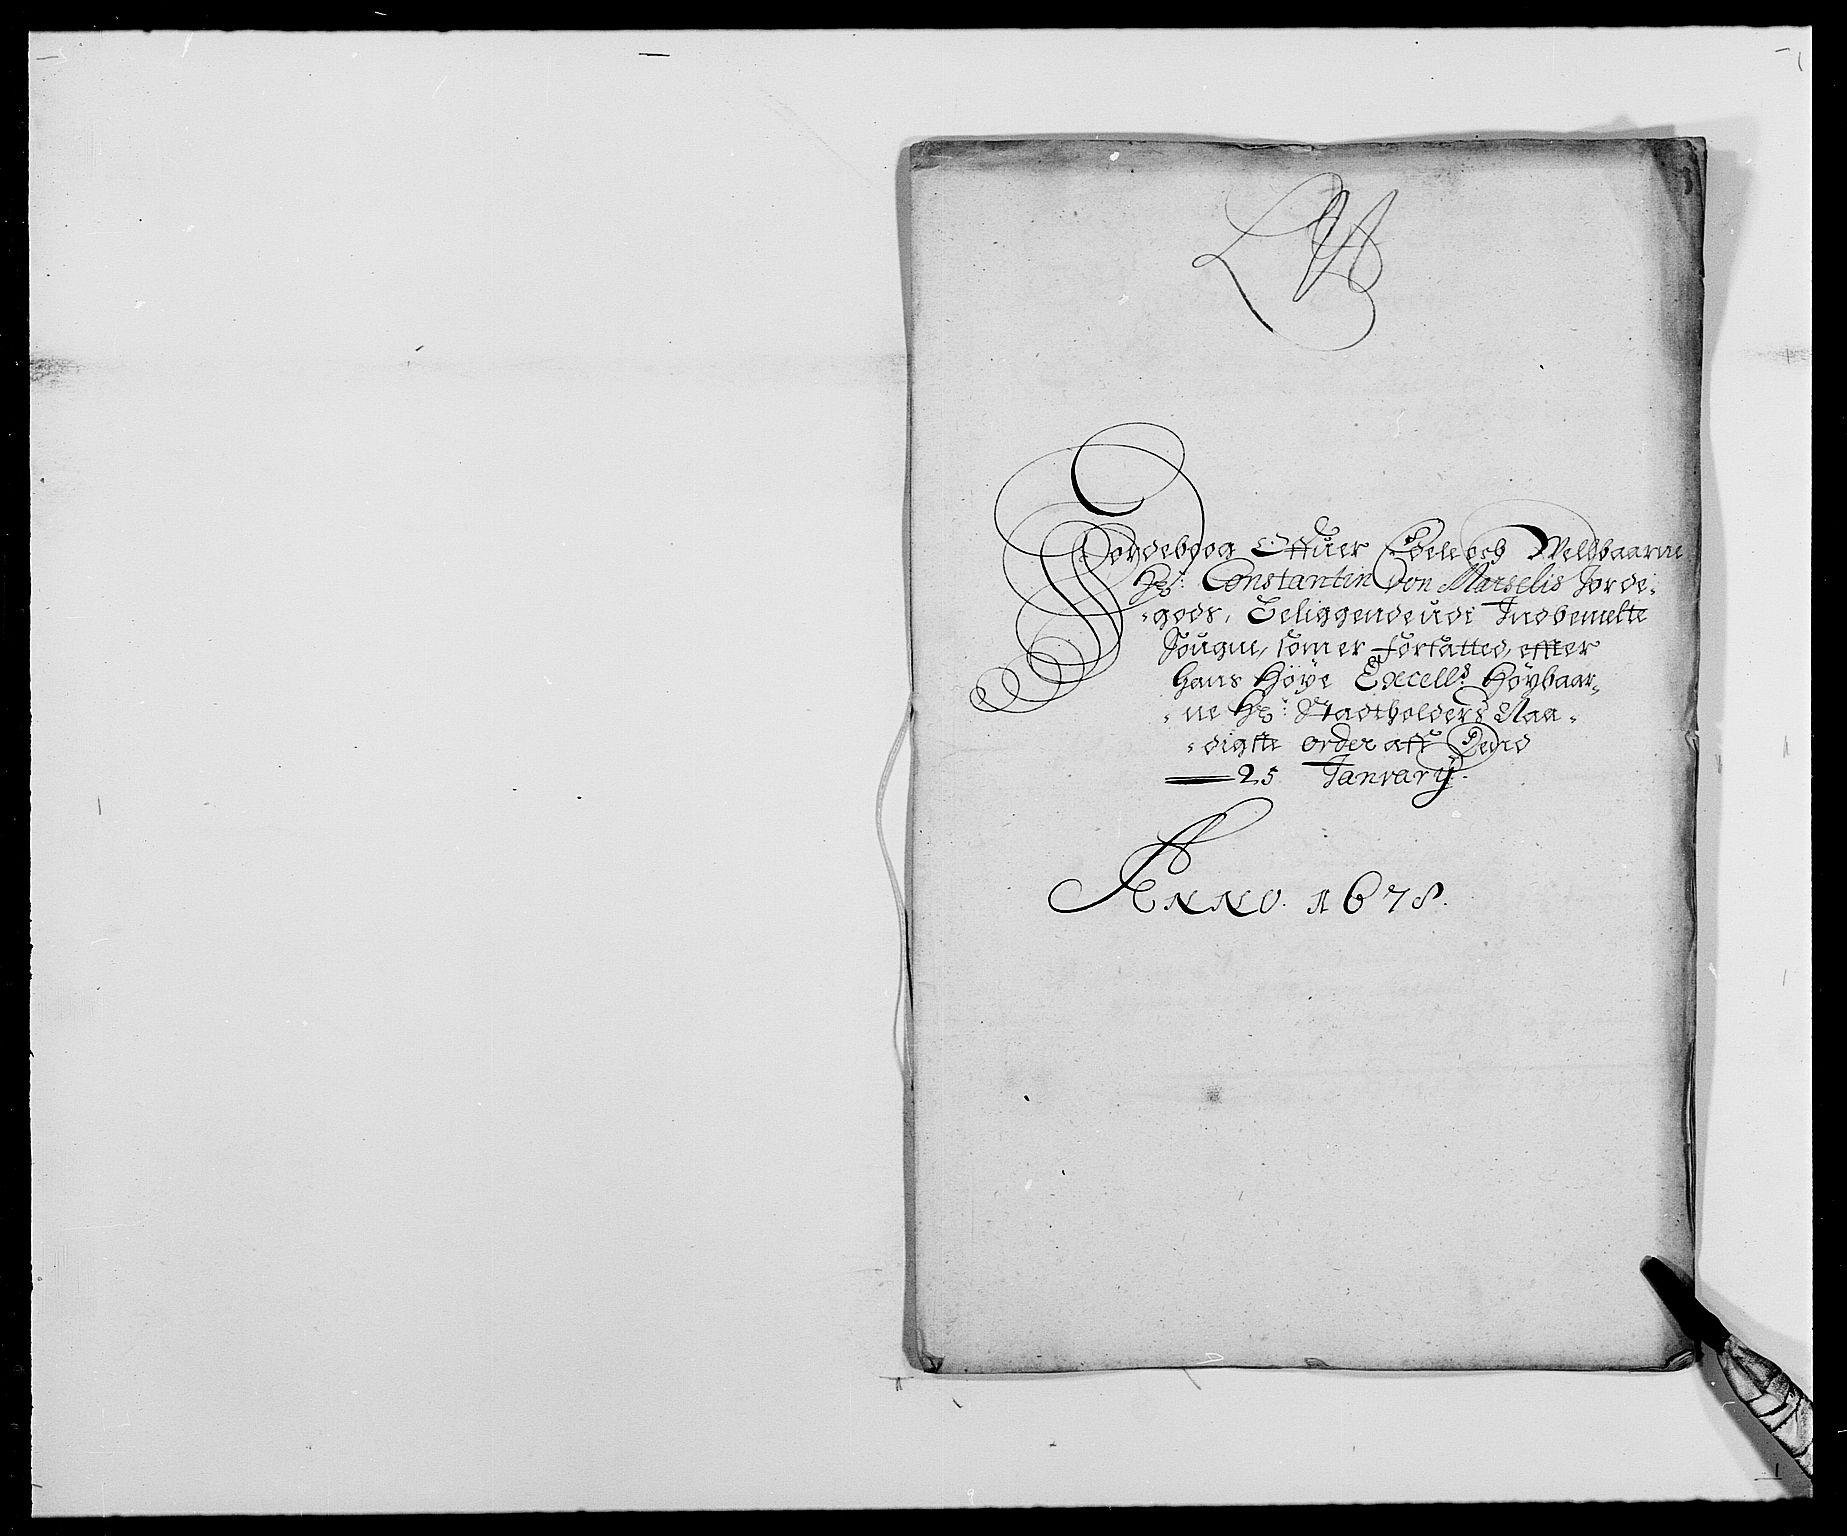 RA, Rentekammeret inntil 1814, Reviderte regnskaper, Fogderegnskap, R27/L1686: Fogderegnskap Lier, 1678-1686, s. 109